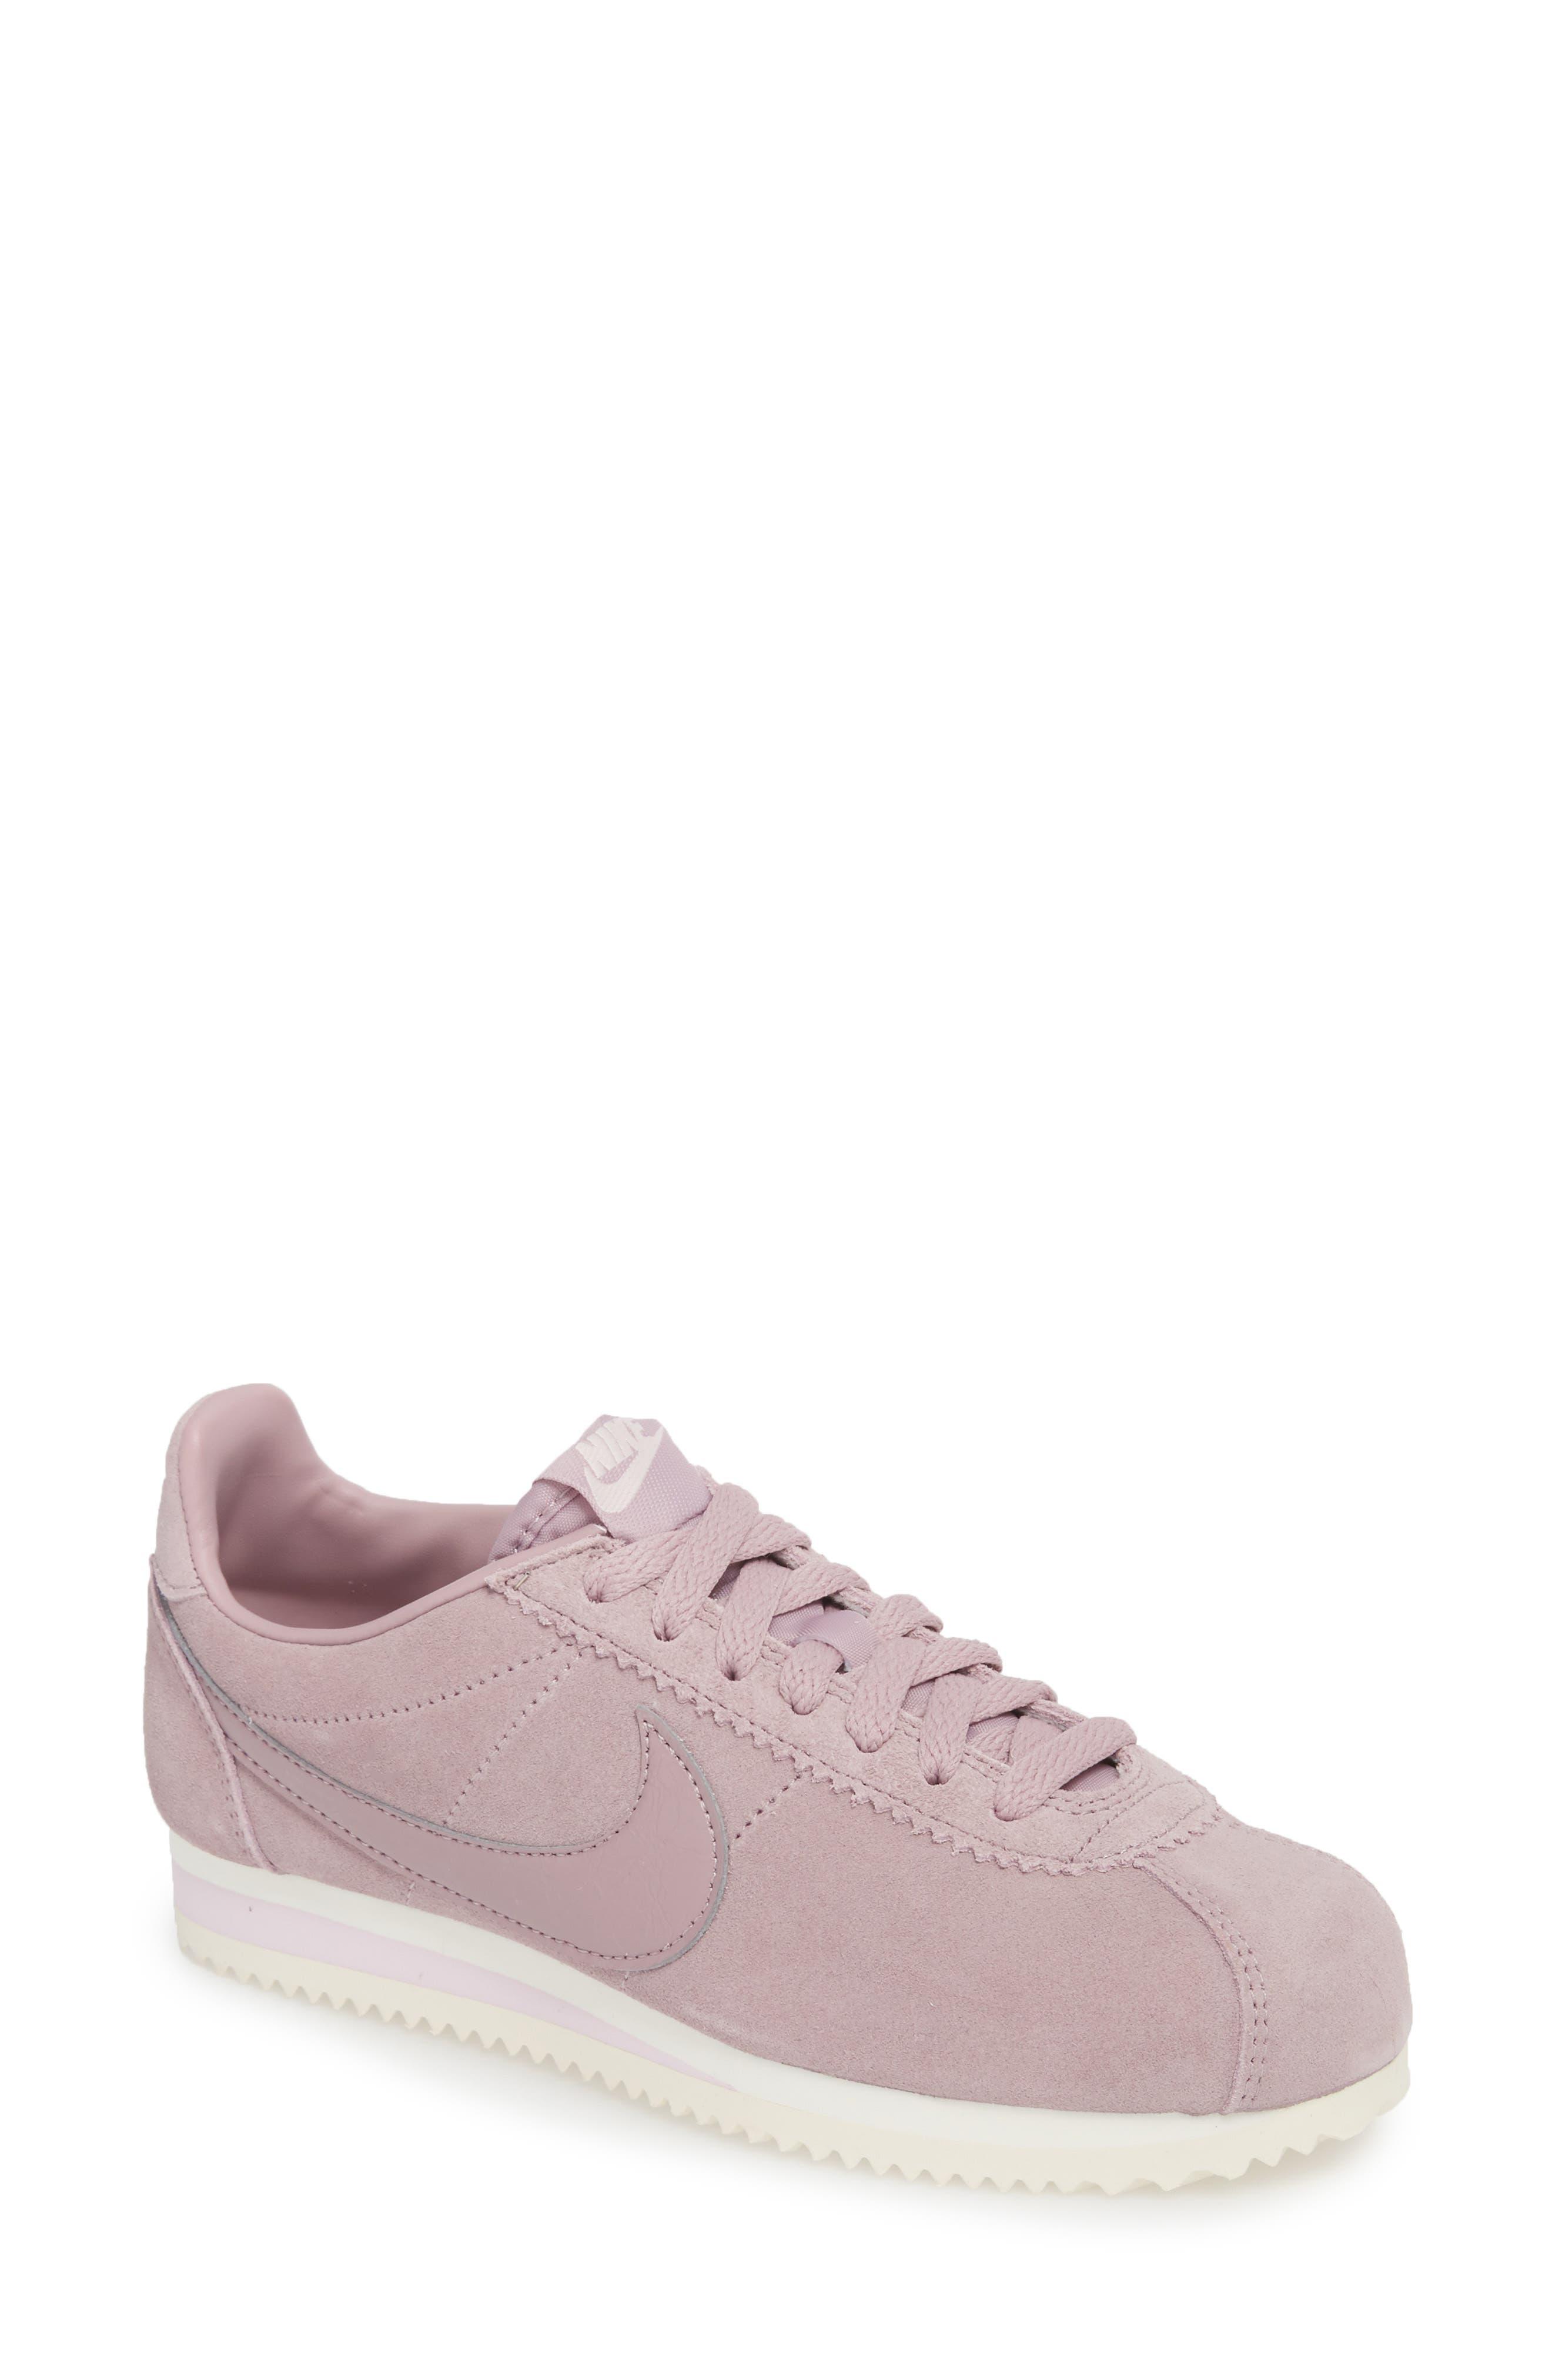 NIKE Classic Cortez Suede Sneaker, Main, color, 650